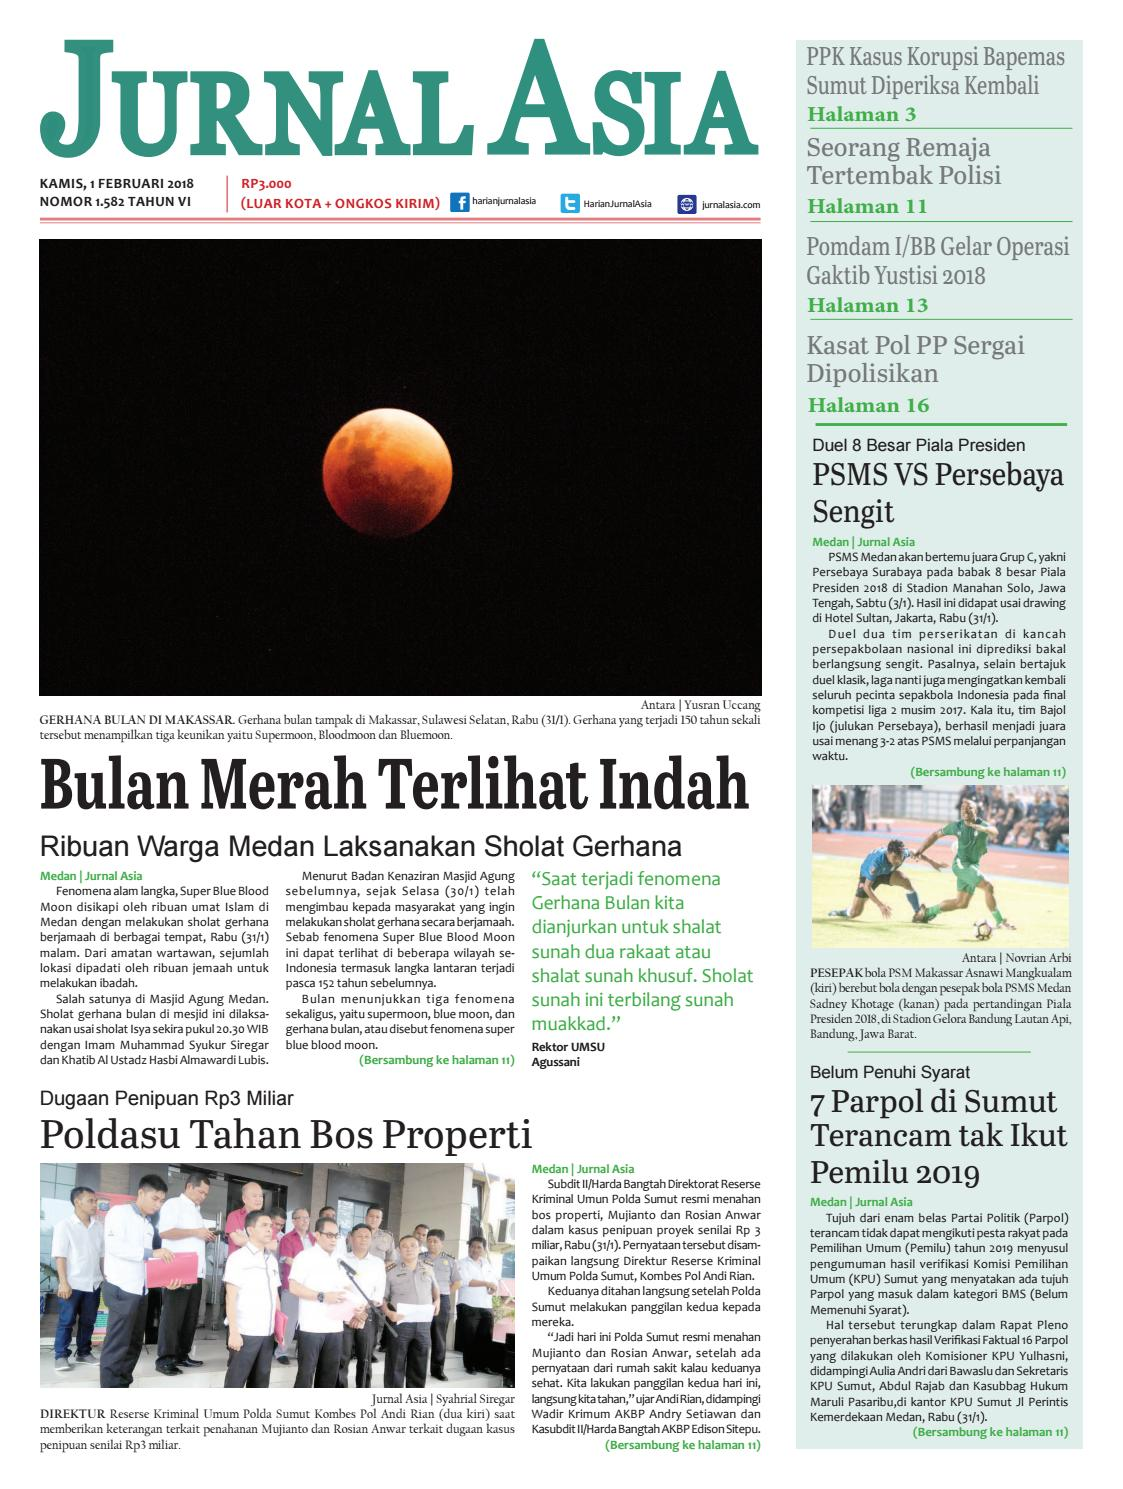 Harian Jurnal Asia Edisi Kamis 01 Februari 2018 By Ttass Bayii Serba Guna Medan Issuu